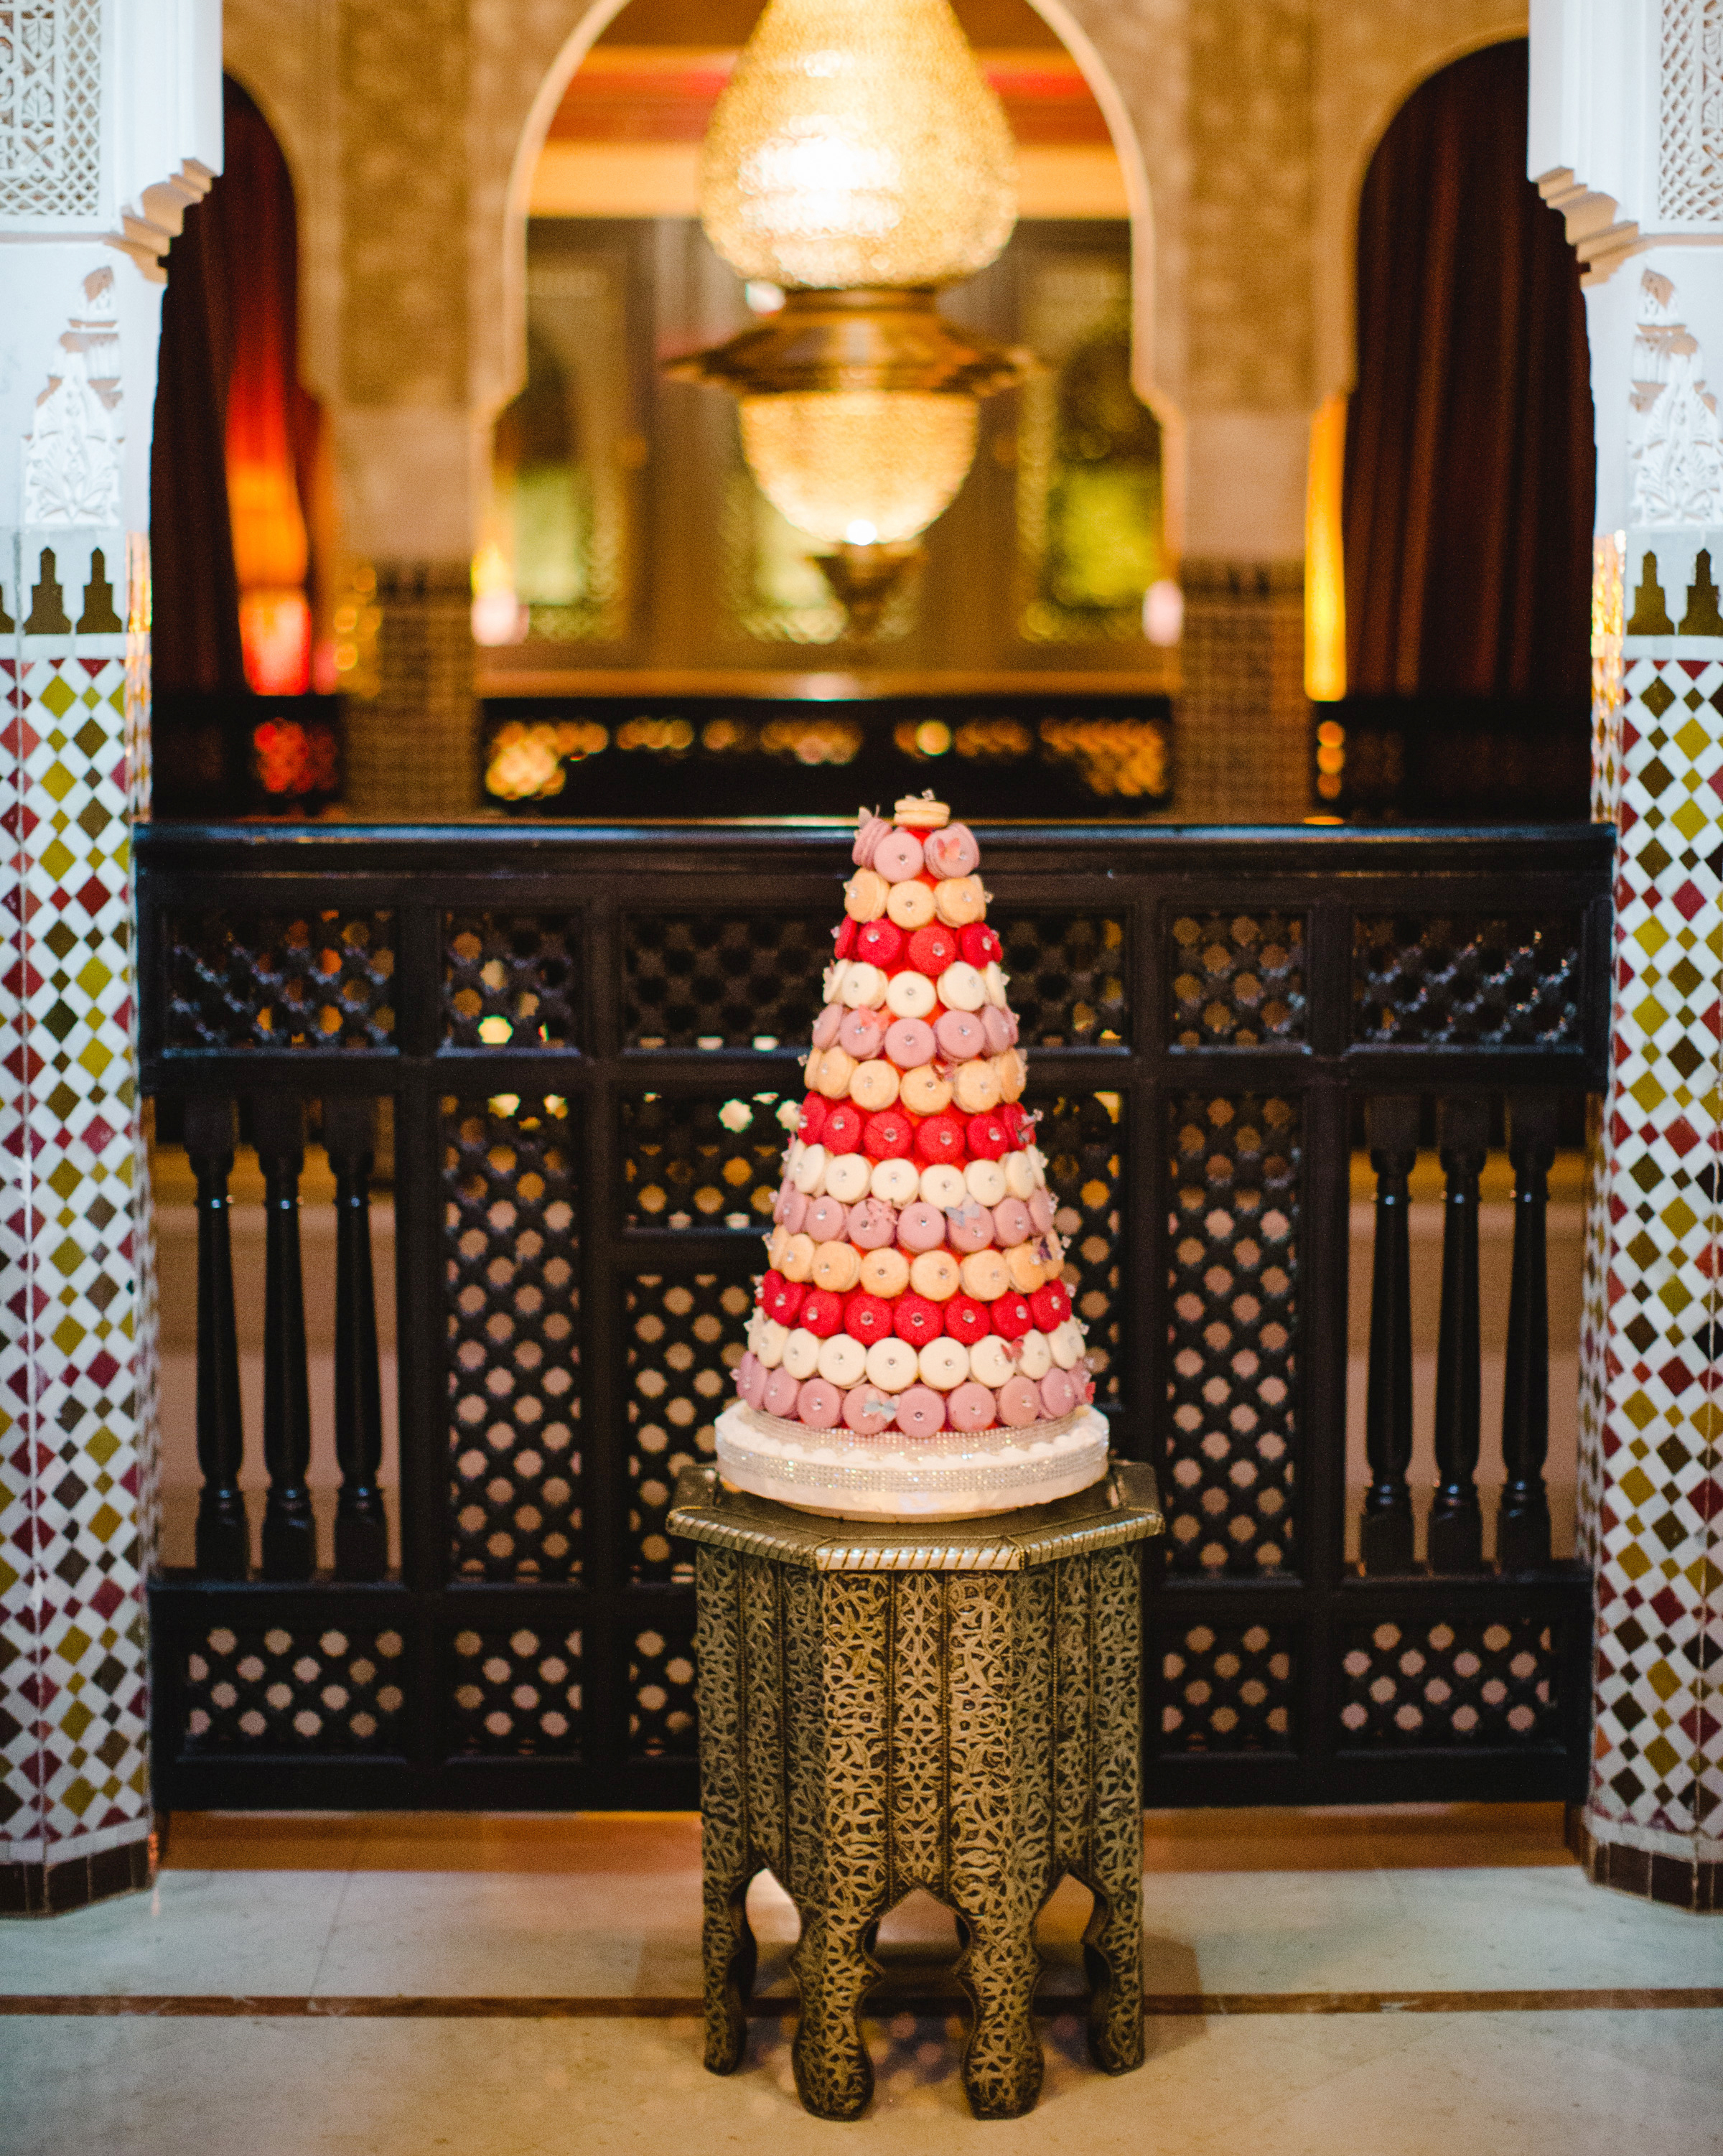 federica-tommaso-wedding-macarons-132r-s112330-1015.jpg